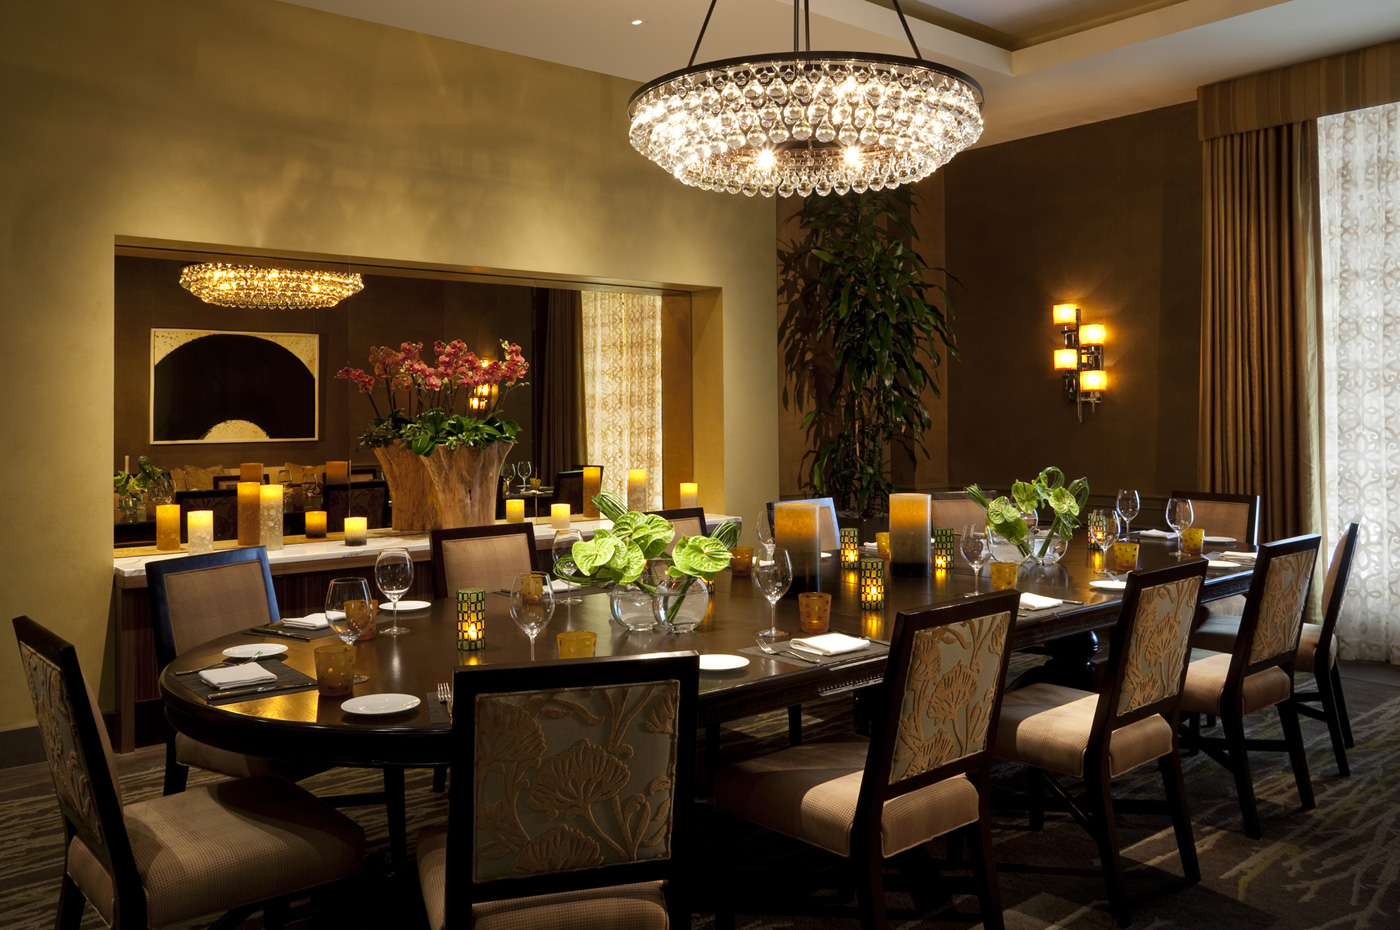 Private Room Dining Los Angeles - [peenmedia.com]